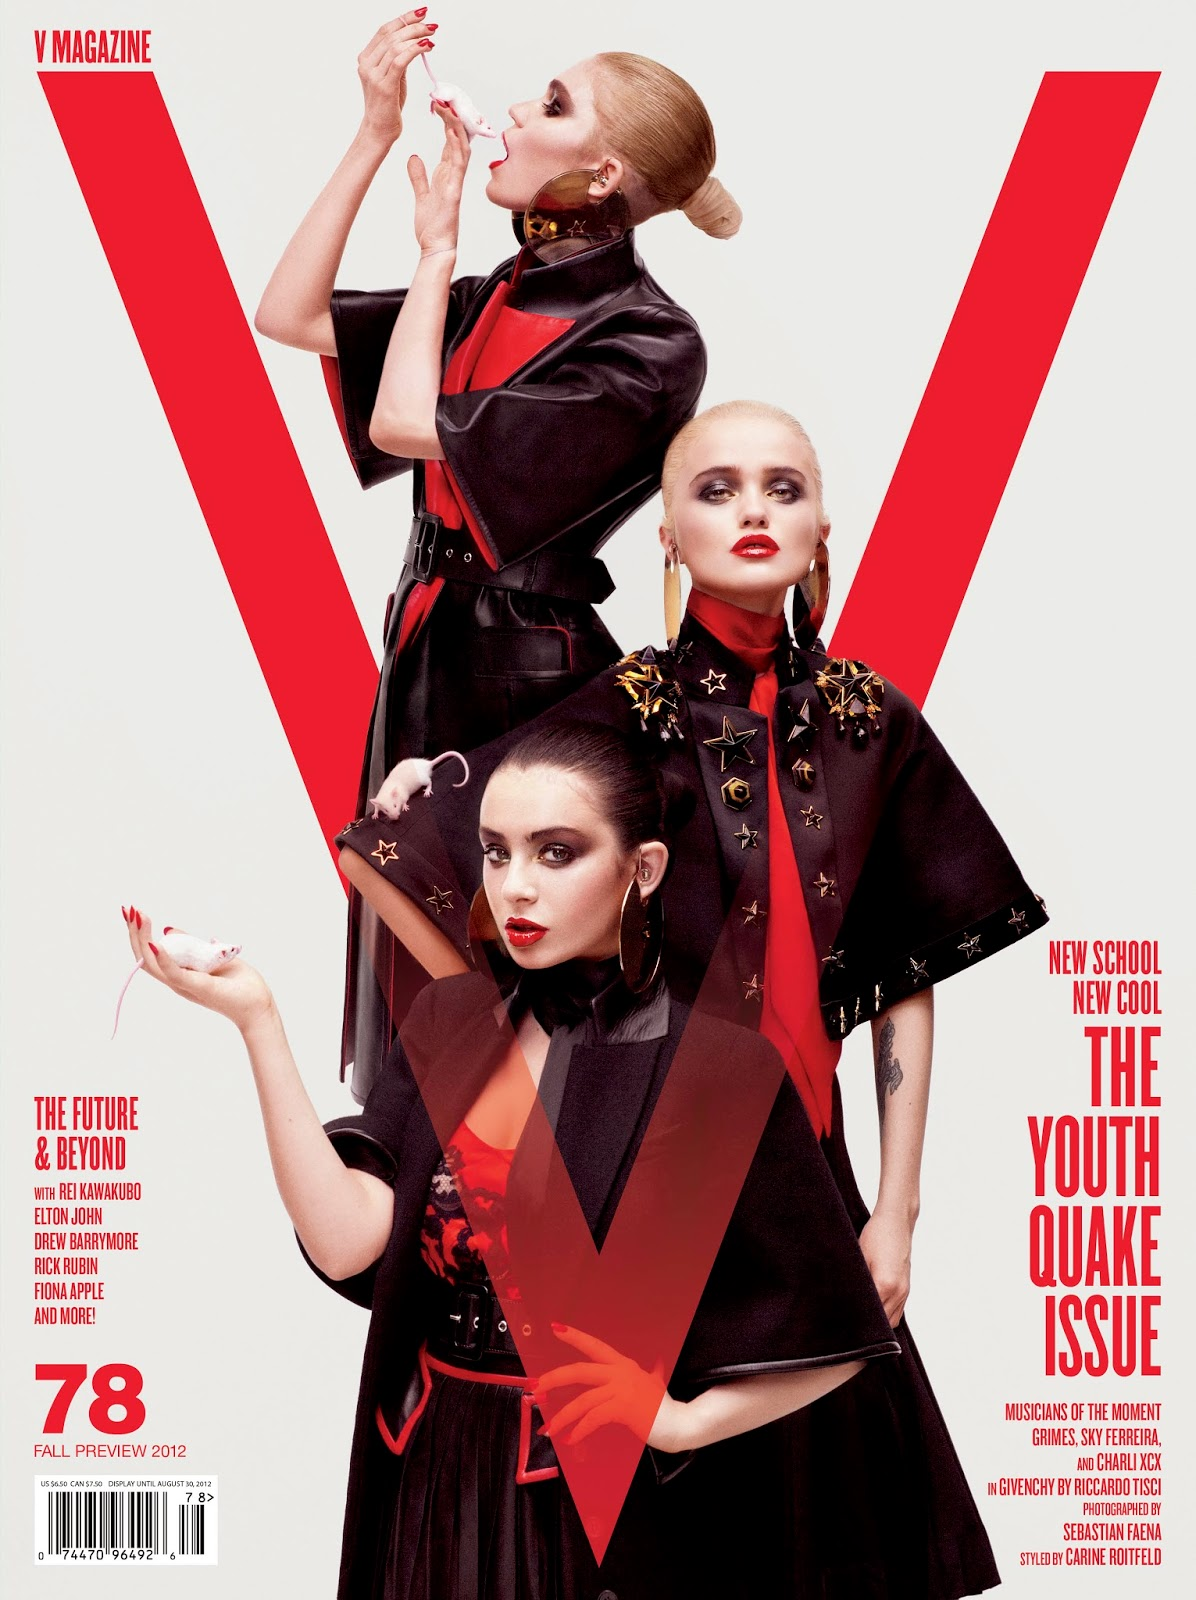 Fashionmonger - Página 4 9